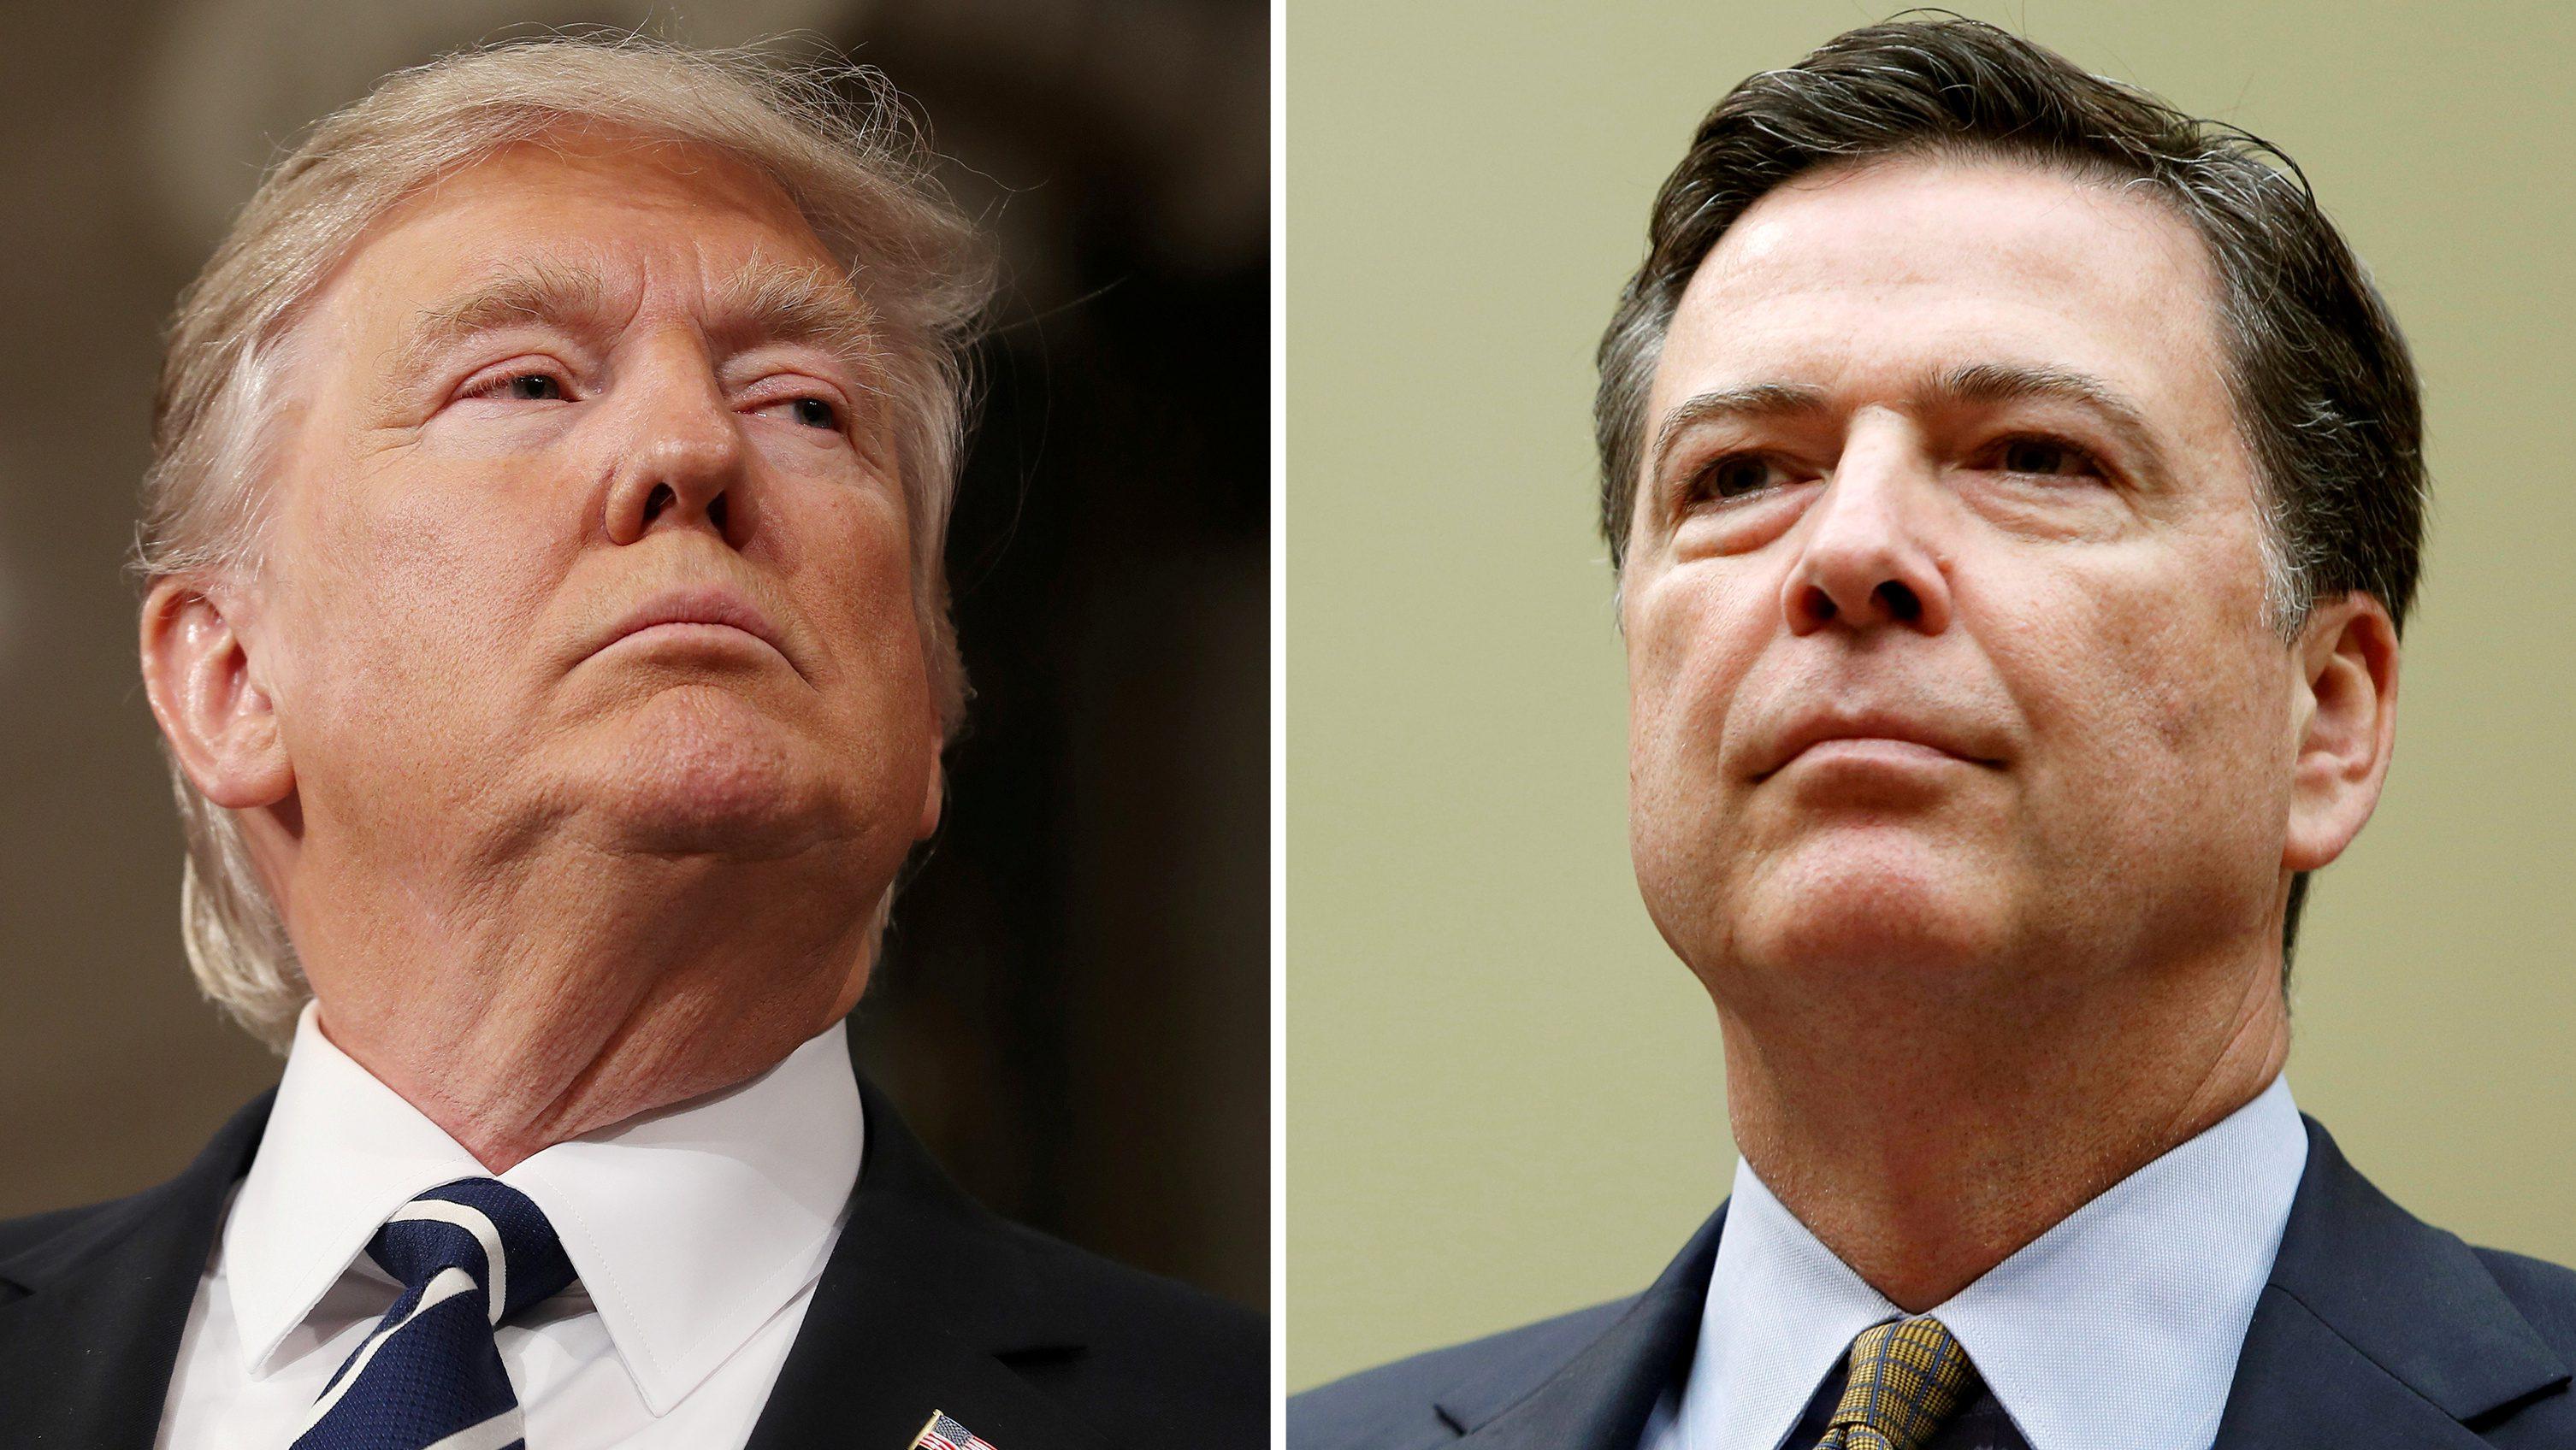 James Comey and Donald Trump